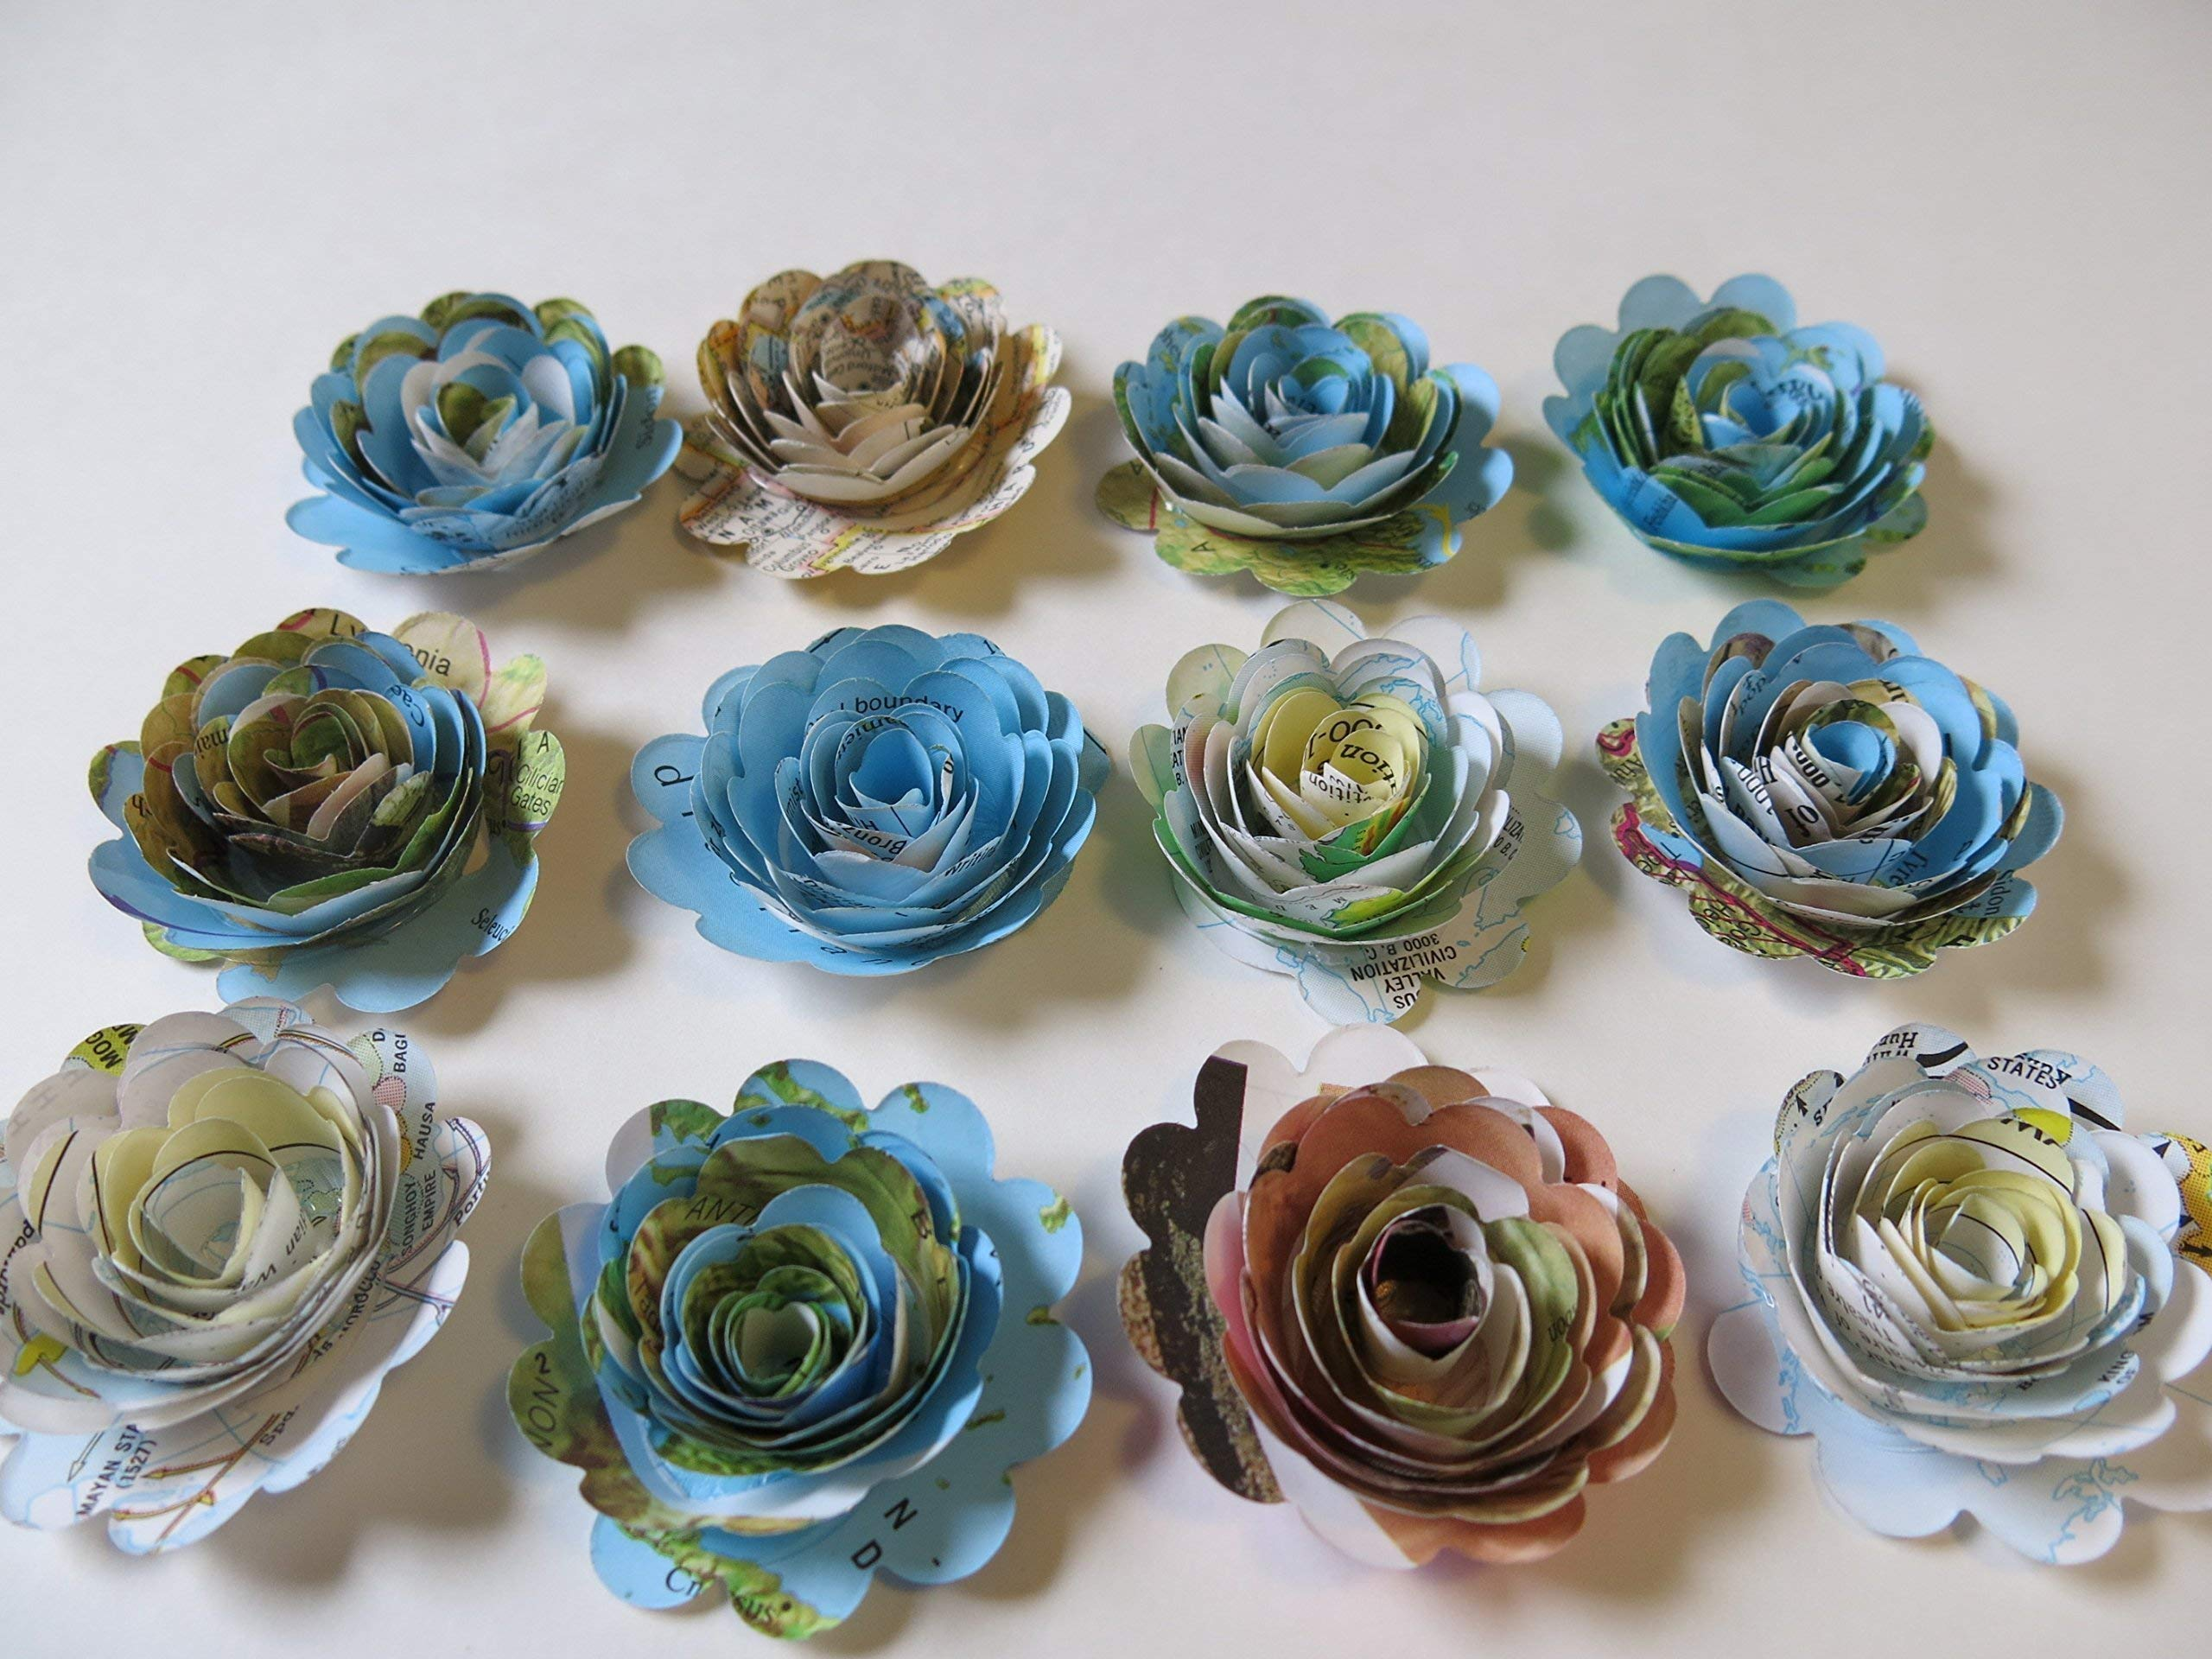 12-Piece-Scalloped-World-Atlas-Roses-Paper-Flowers-Set-Travel-Theme-Floral-Table-Decor-15-Rosettes